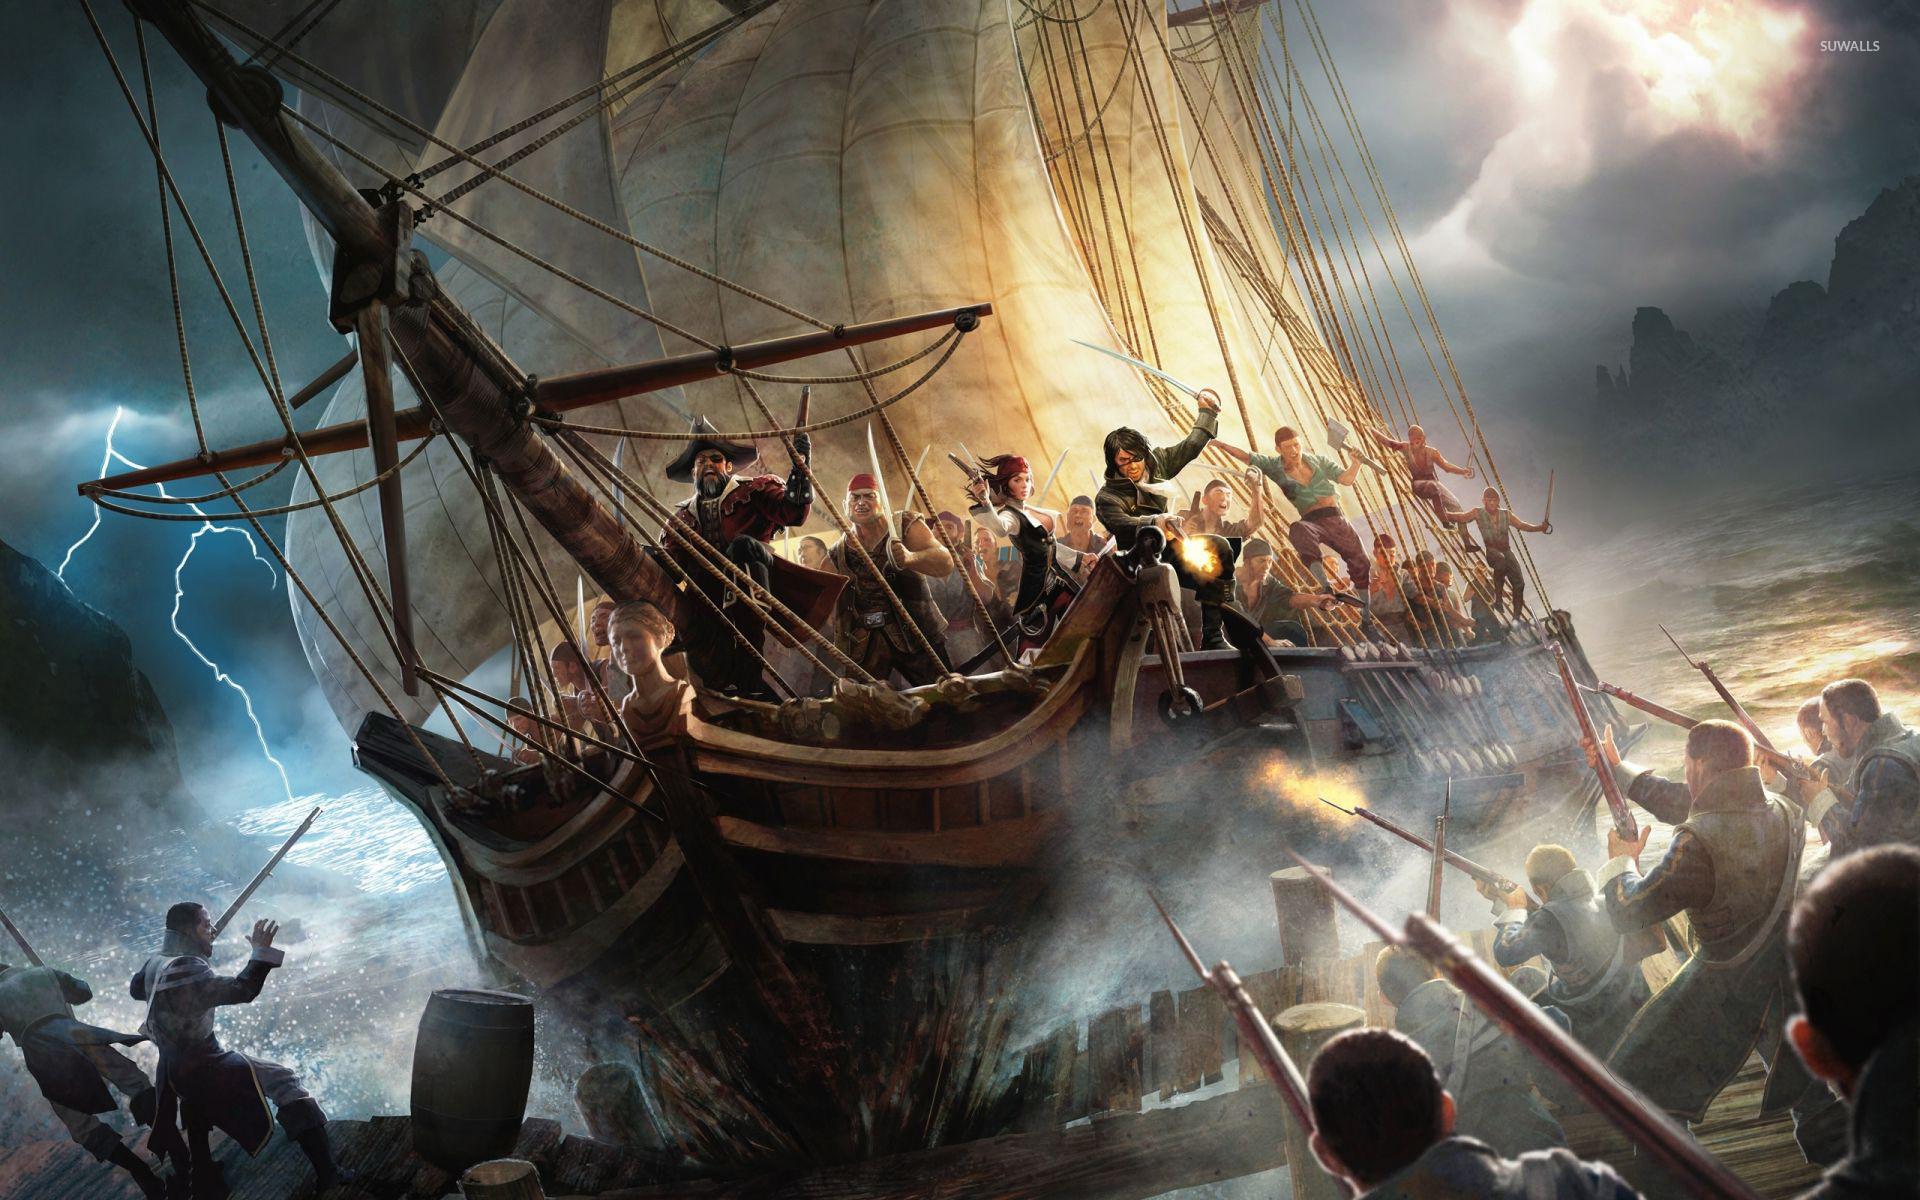 Pirate ship wallpapers wallpapertag - Anime pirate wallpaper ...